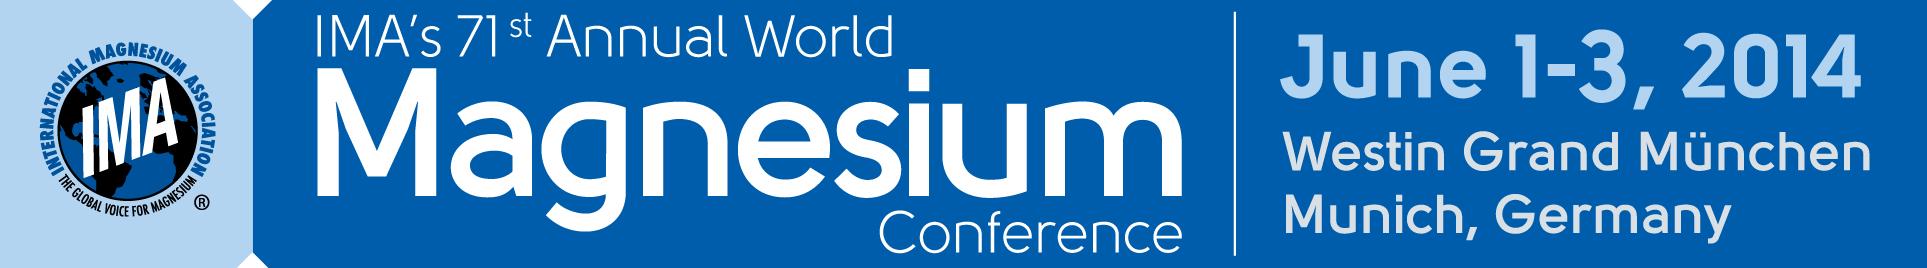 IMA's 71st World Magnesium Conference